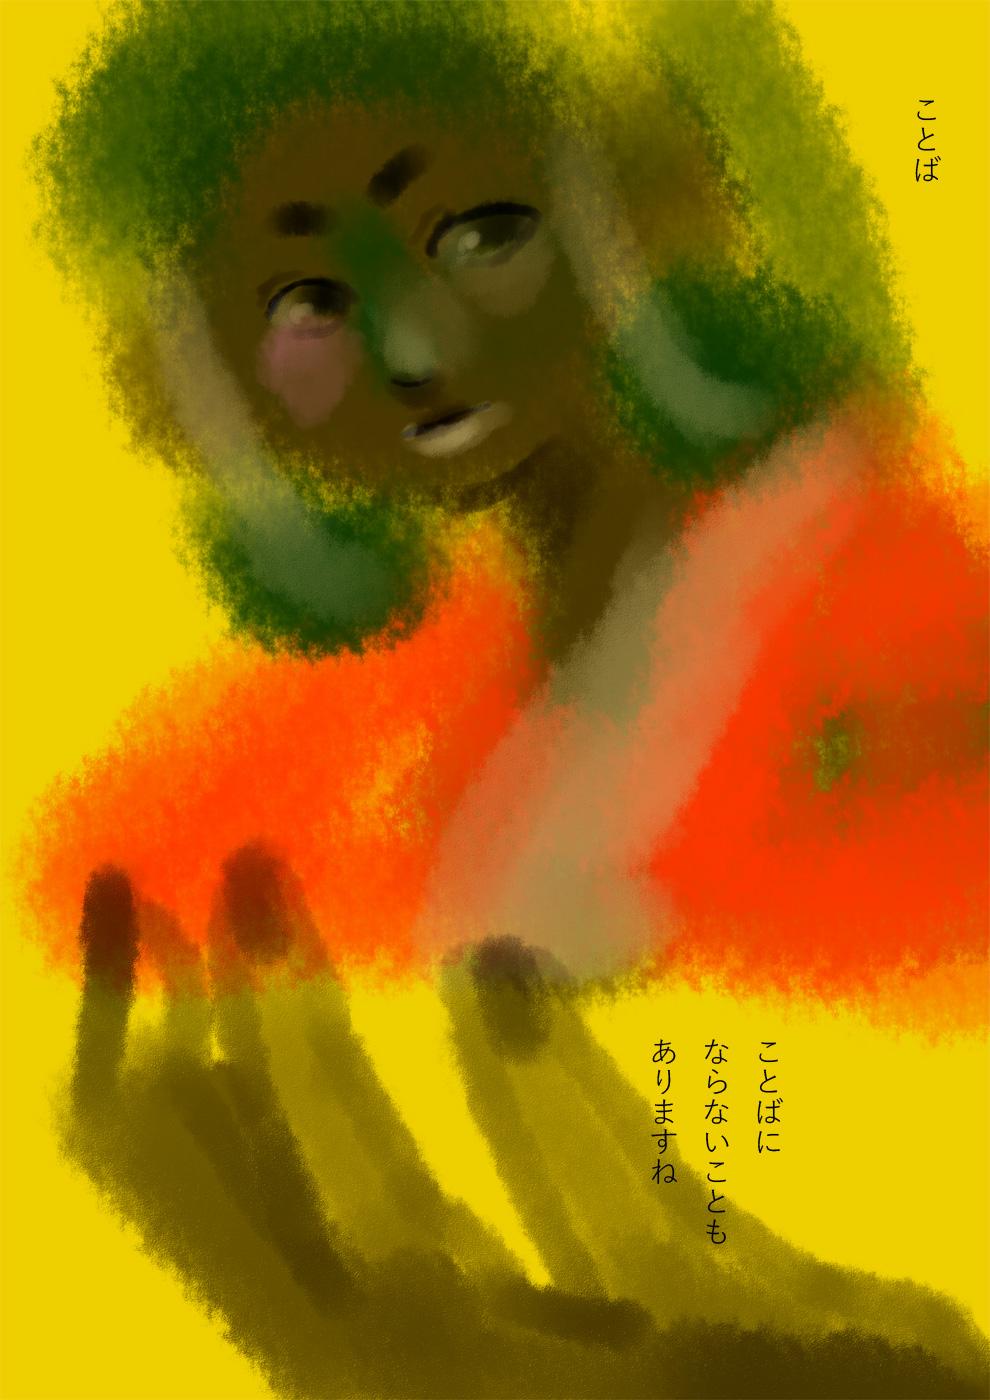 http://ahito.com/comic/ehon/voice/img/2018/20180324_3/01.jpg